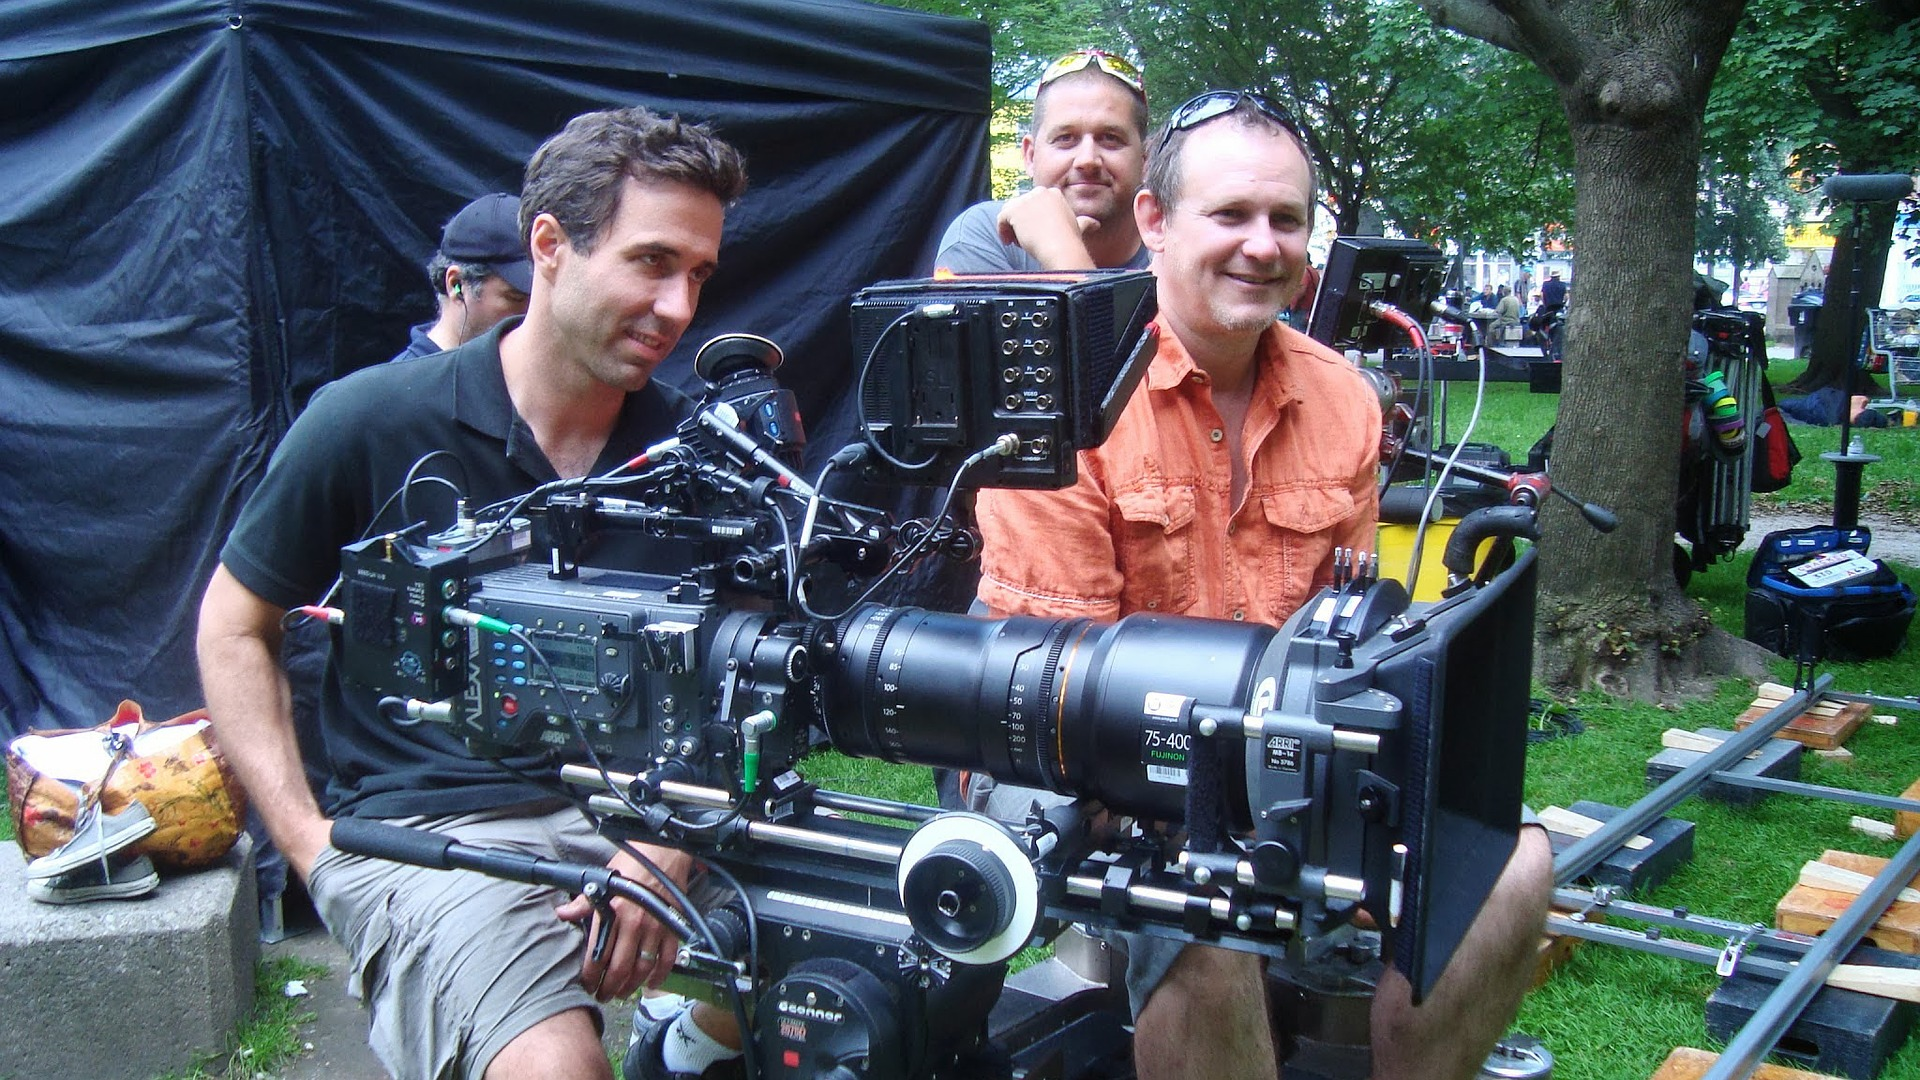 shooting low budget movies - HD1920×1080